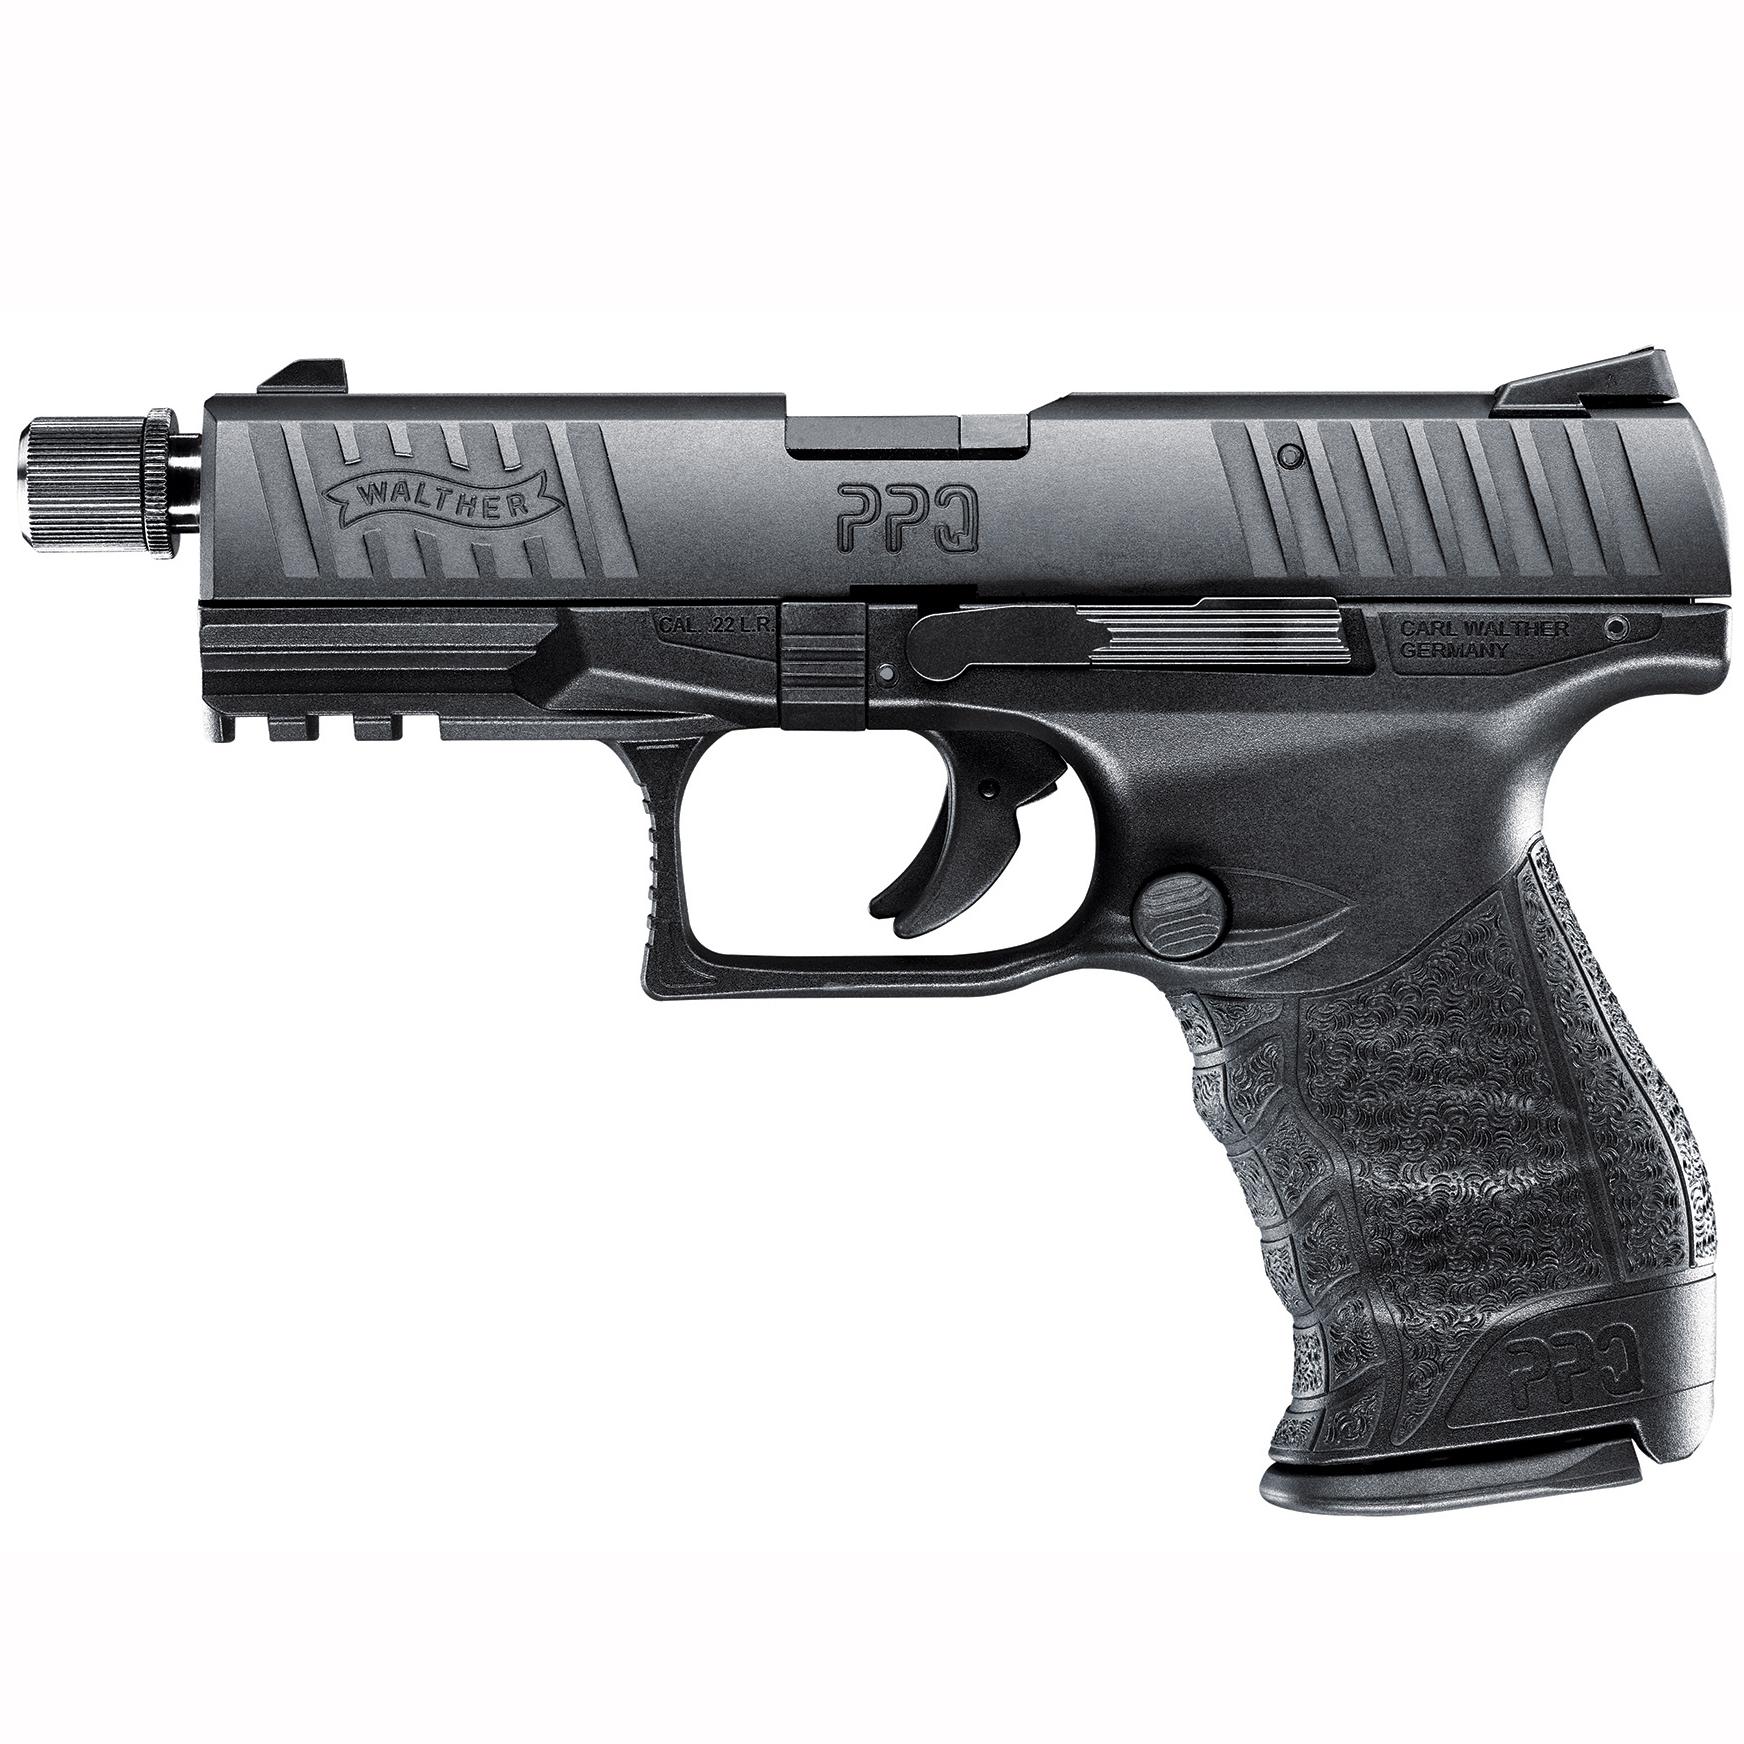 Walther PPQ M2 22 SD Handgun, .22 LR, 12 Rd.